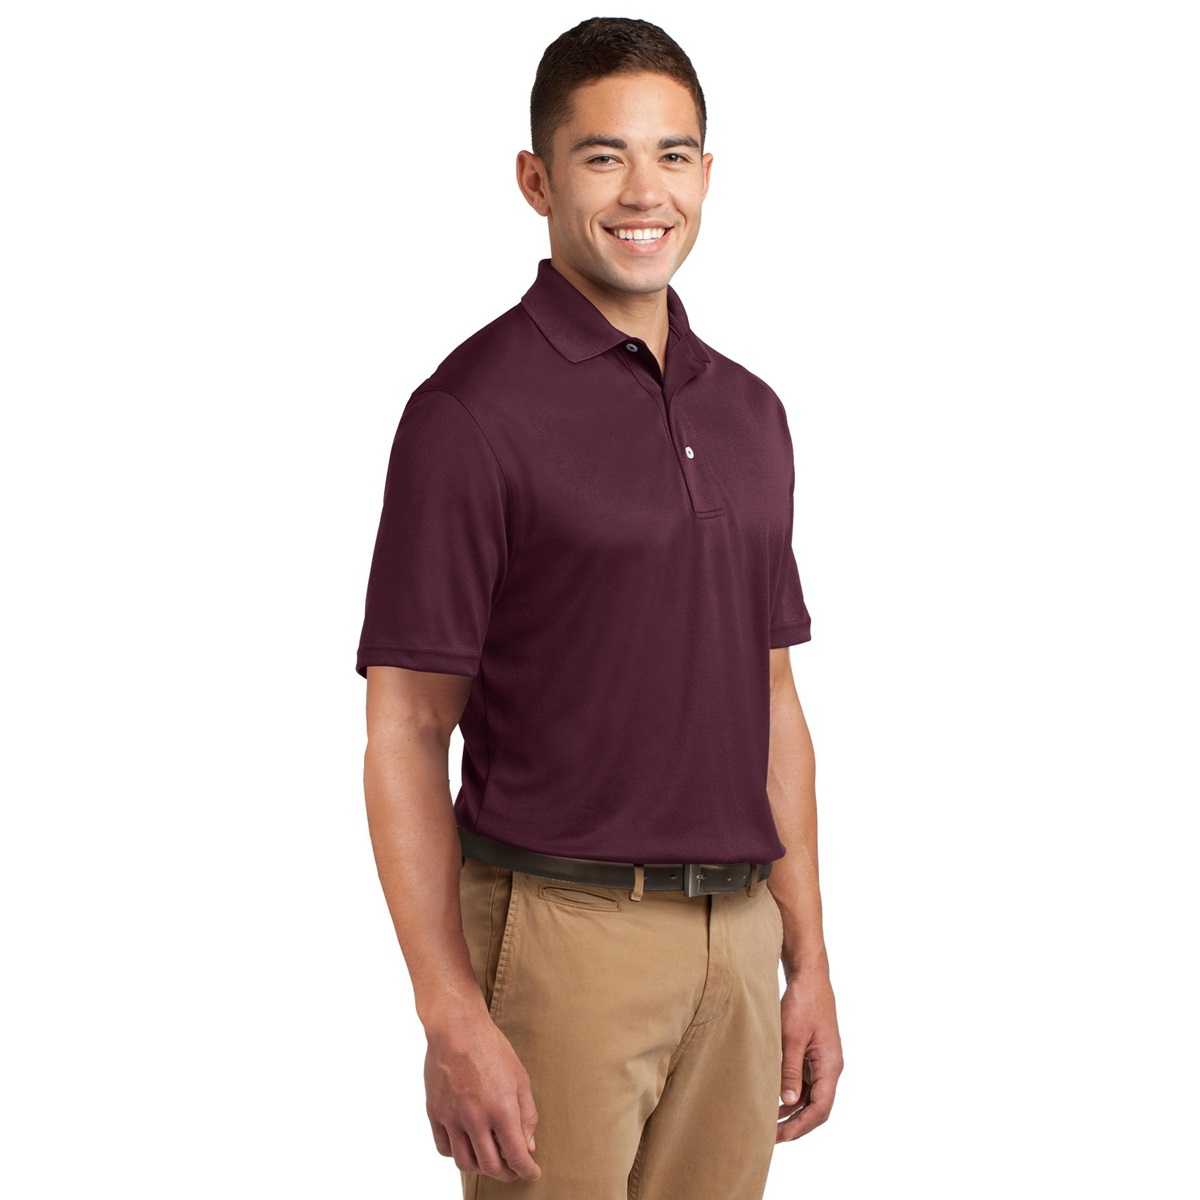 Sport tek k469 dri mesh polo shirt maroon for Maroon dri fit polo shirt